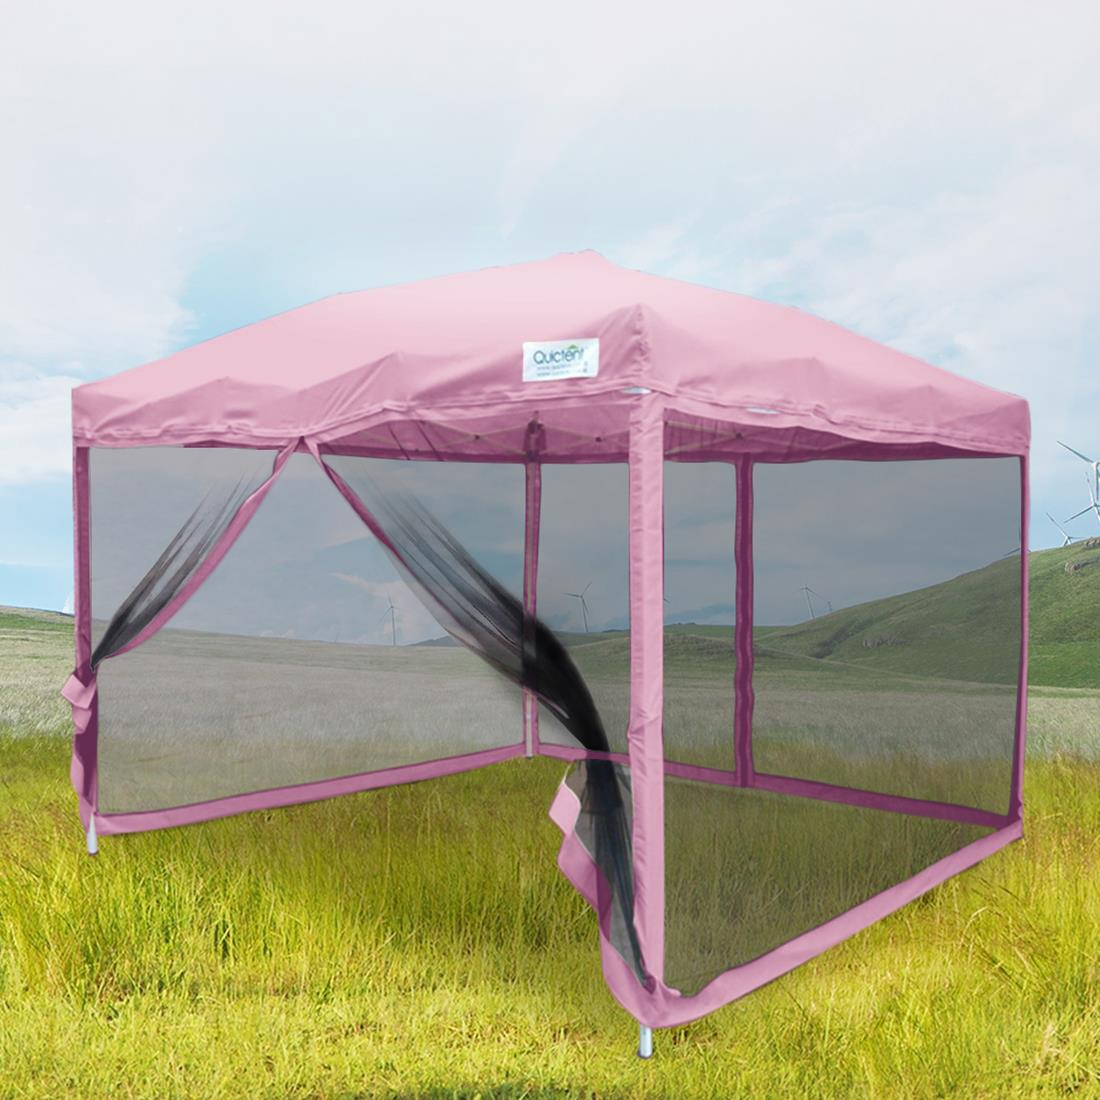 Quictent-10x10-8x8-Pop-Up-Gazebo-Party-Tent- & Quictent 10x10/8x8 Pop Up Gazebo Party Tent Canopy mesh Screen ...